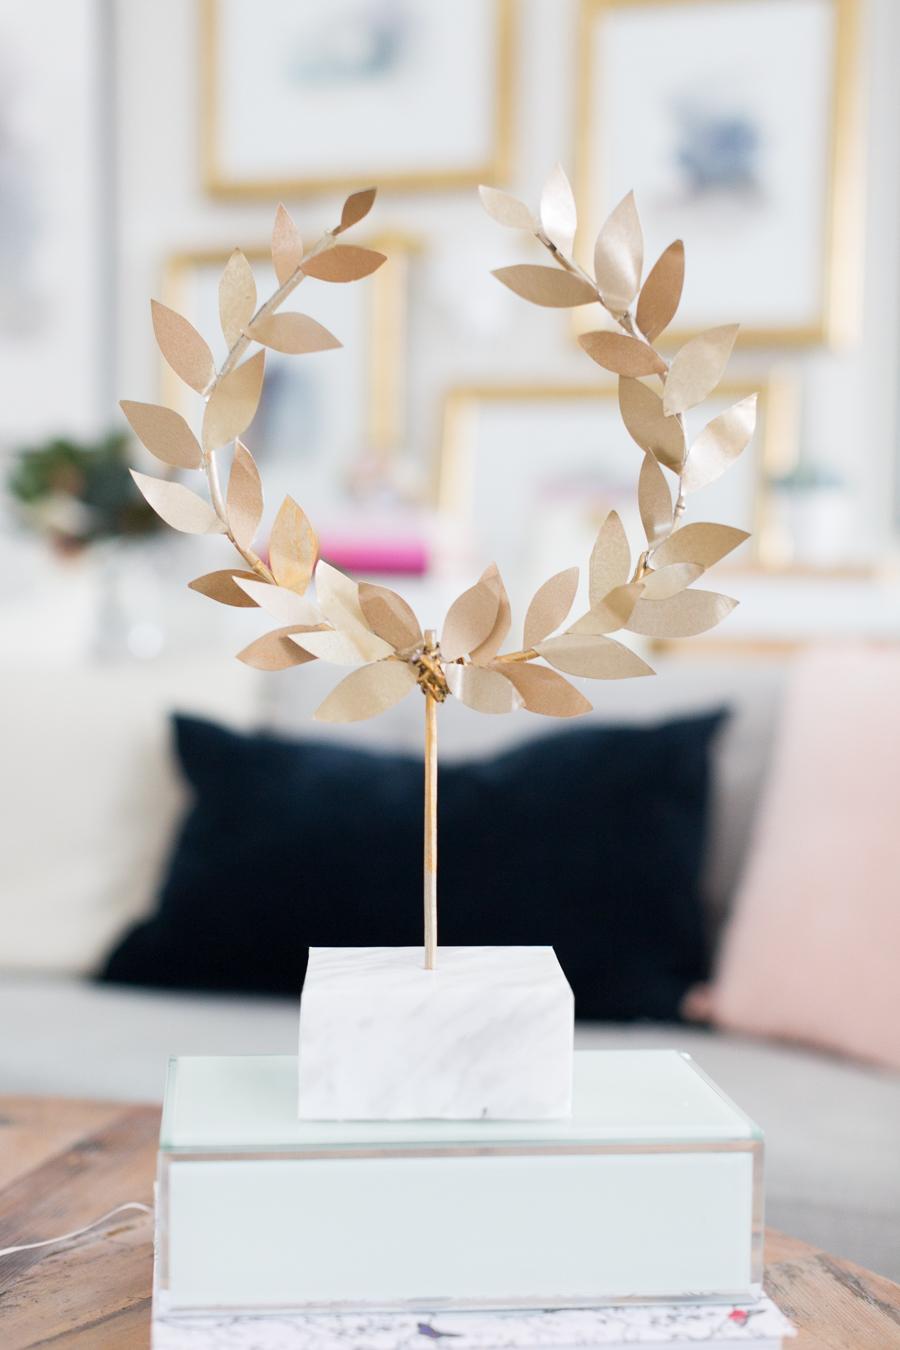 faux kotinos wreath craftberrybush-15